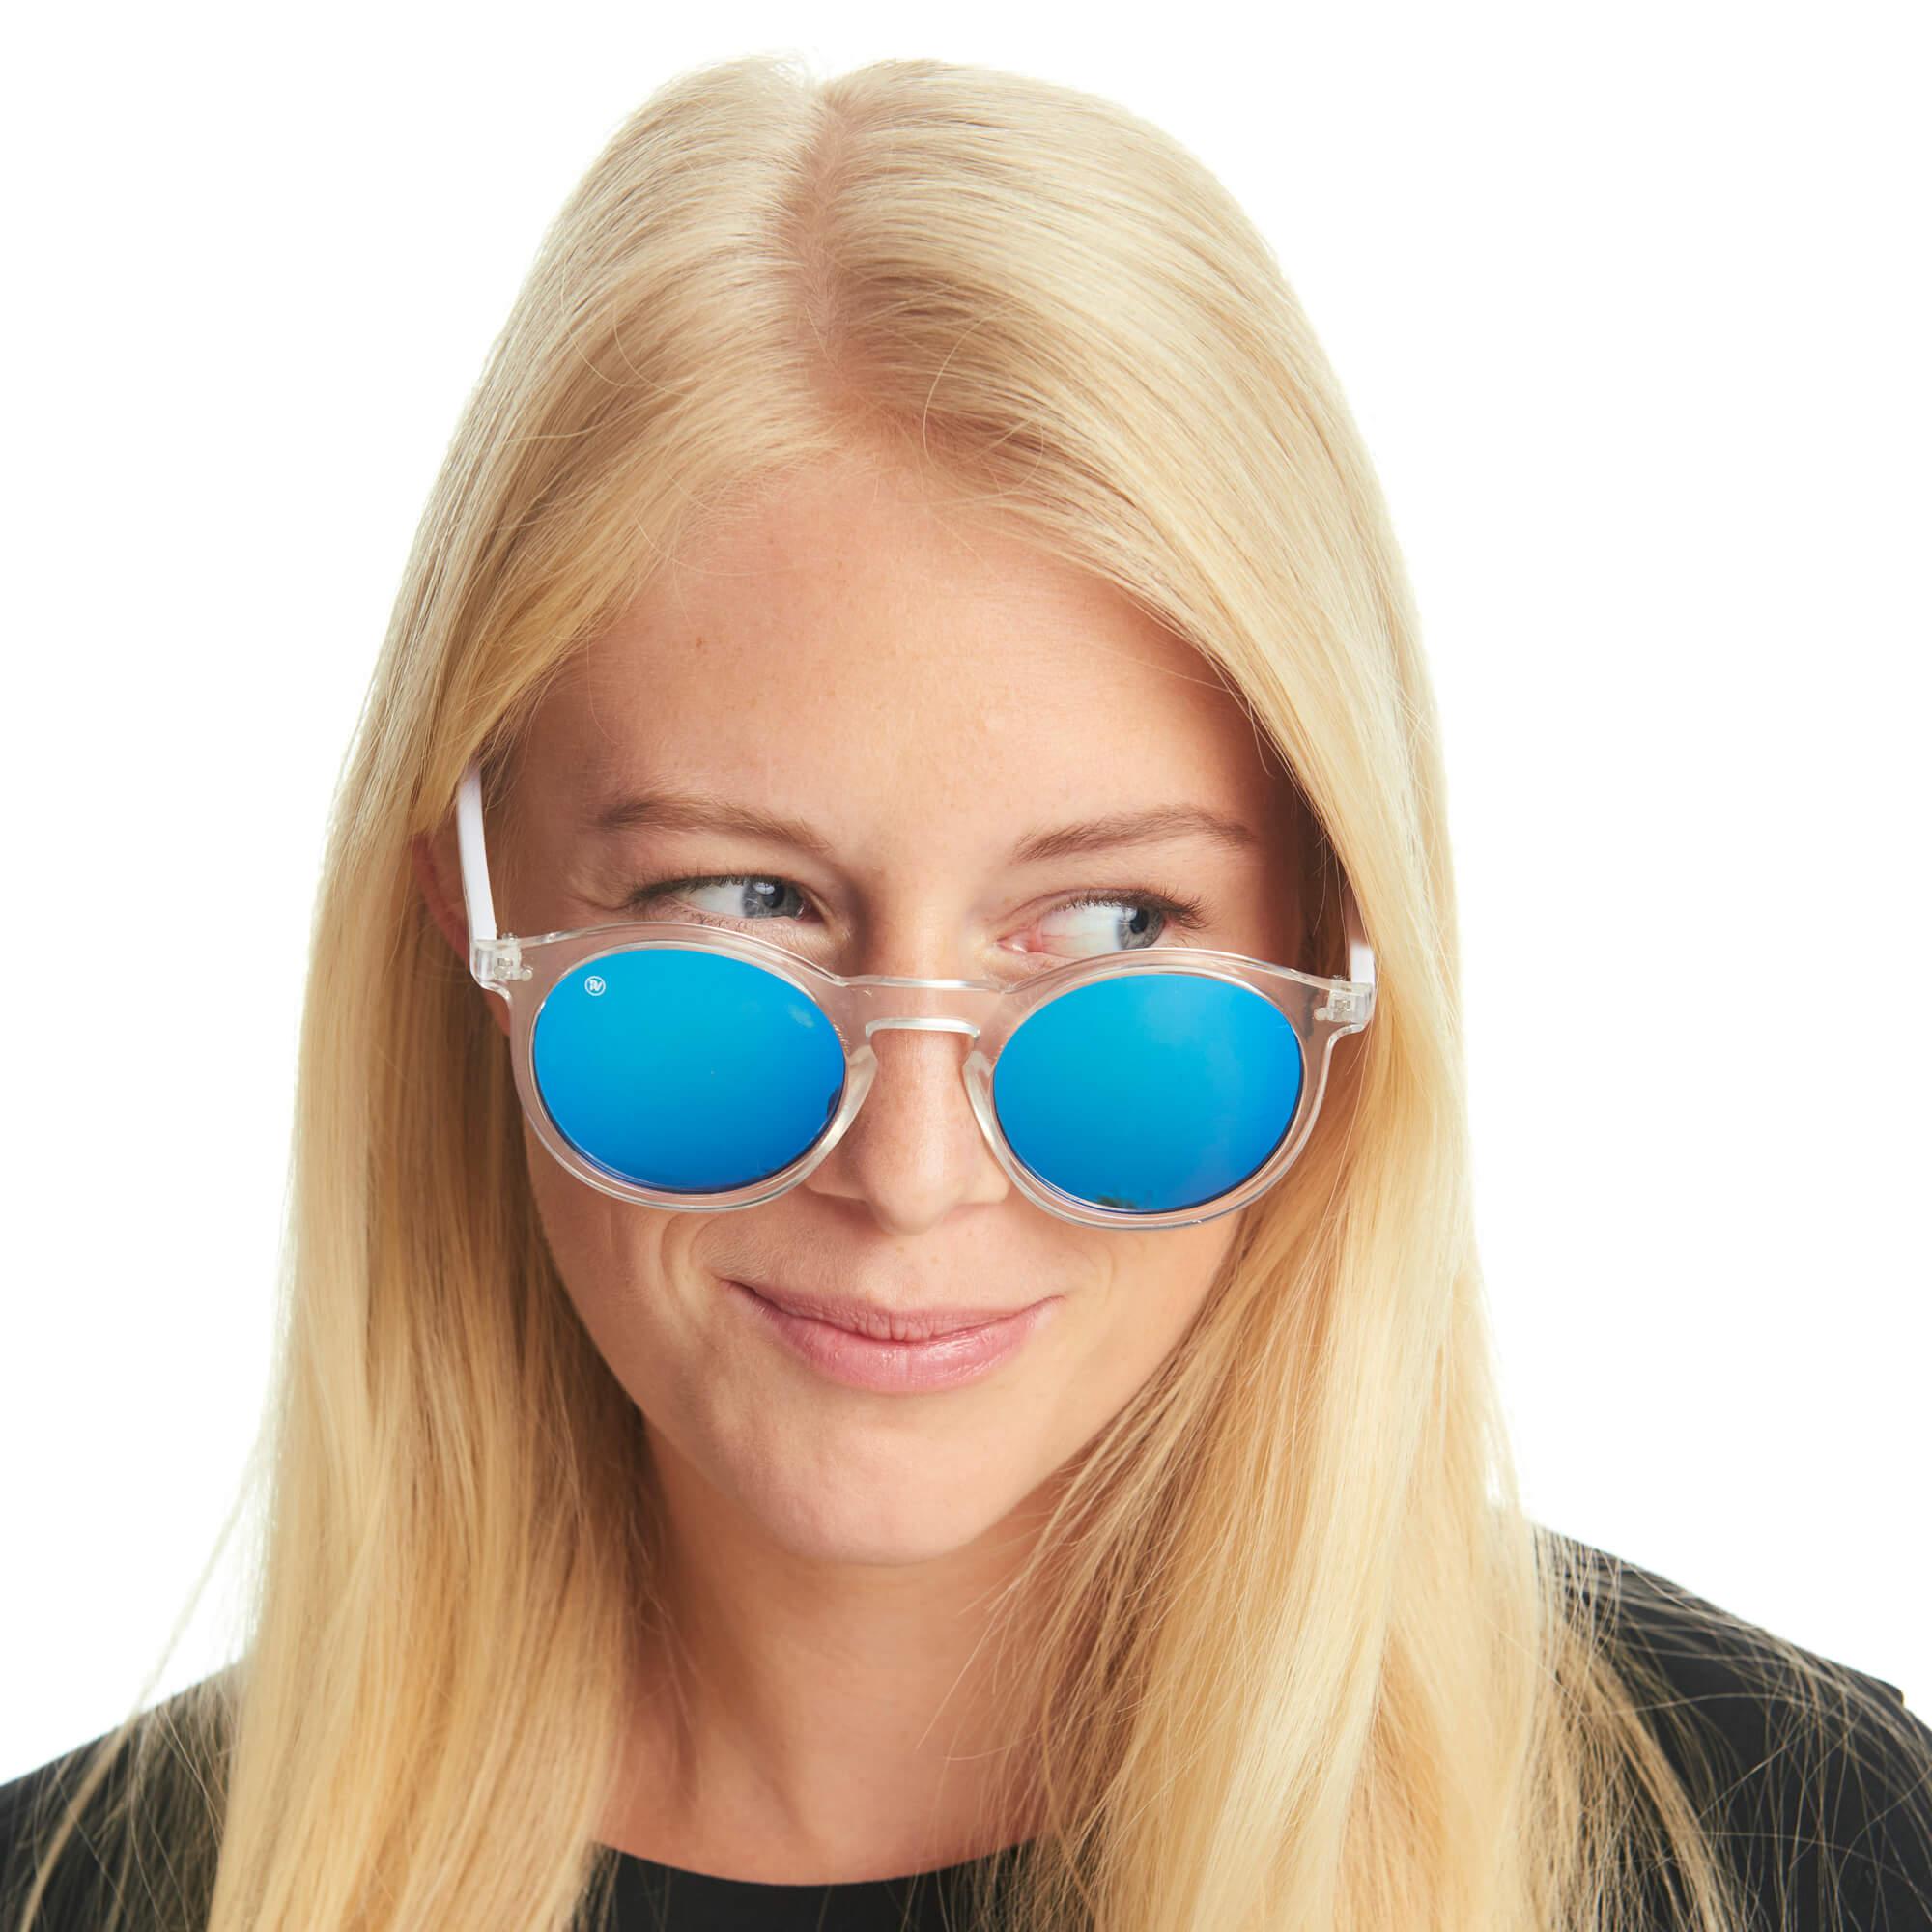 Blue Shine von ParookaVille Festival - SunGlasses jetzt im My Festival Shop Shop